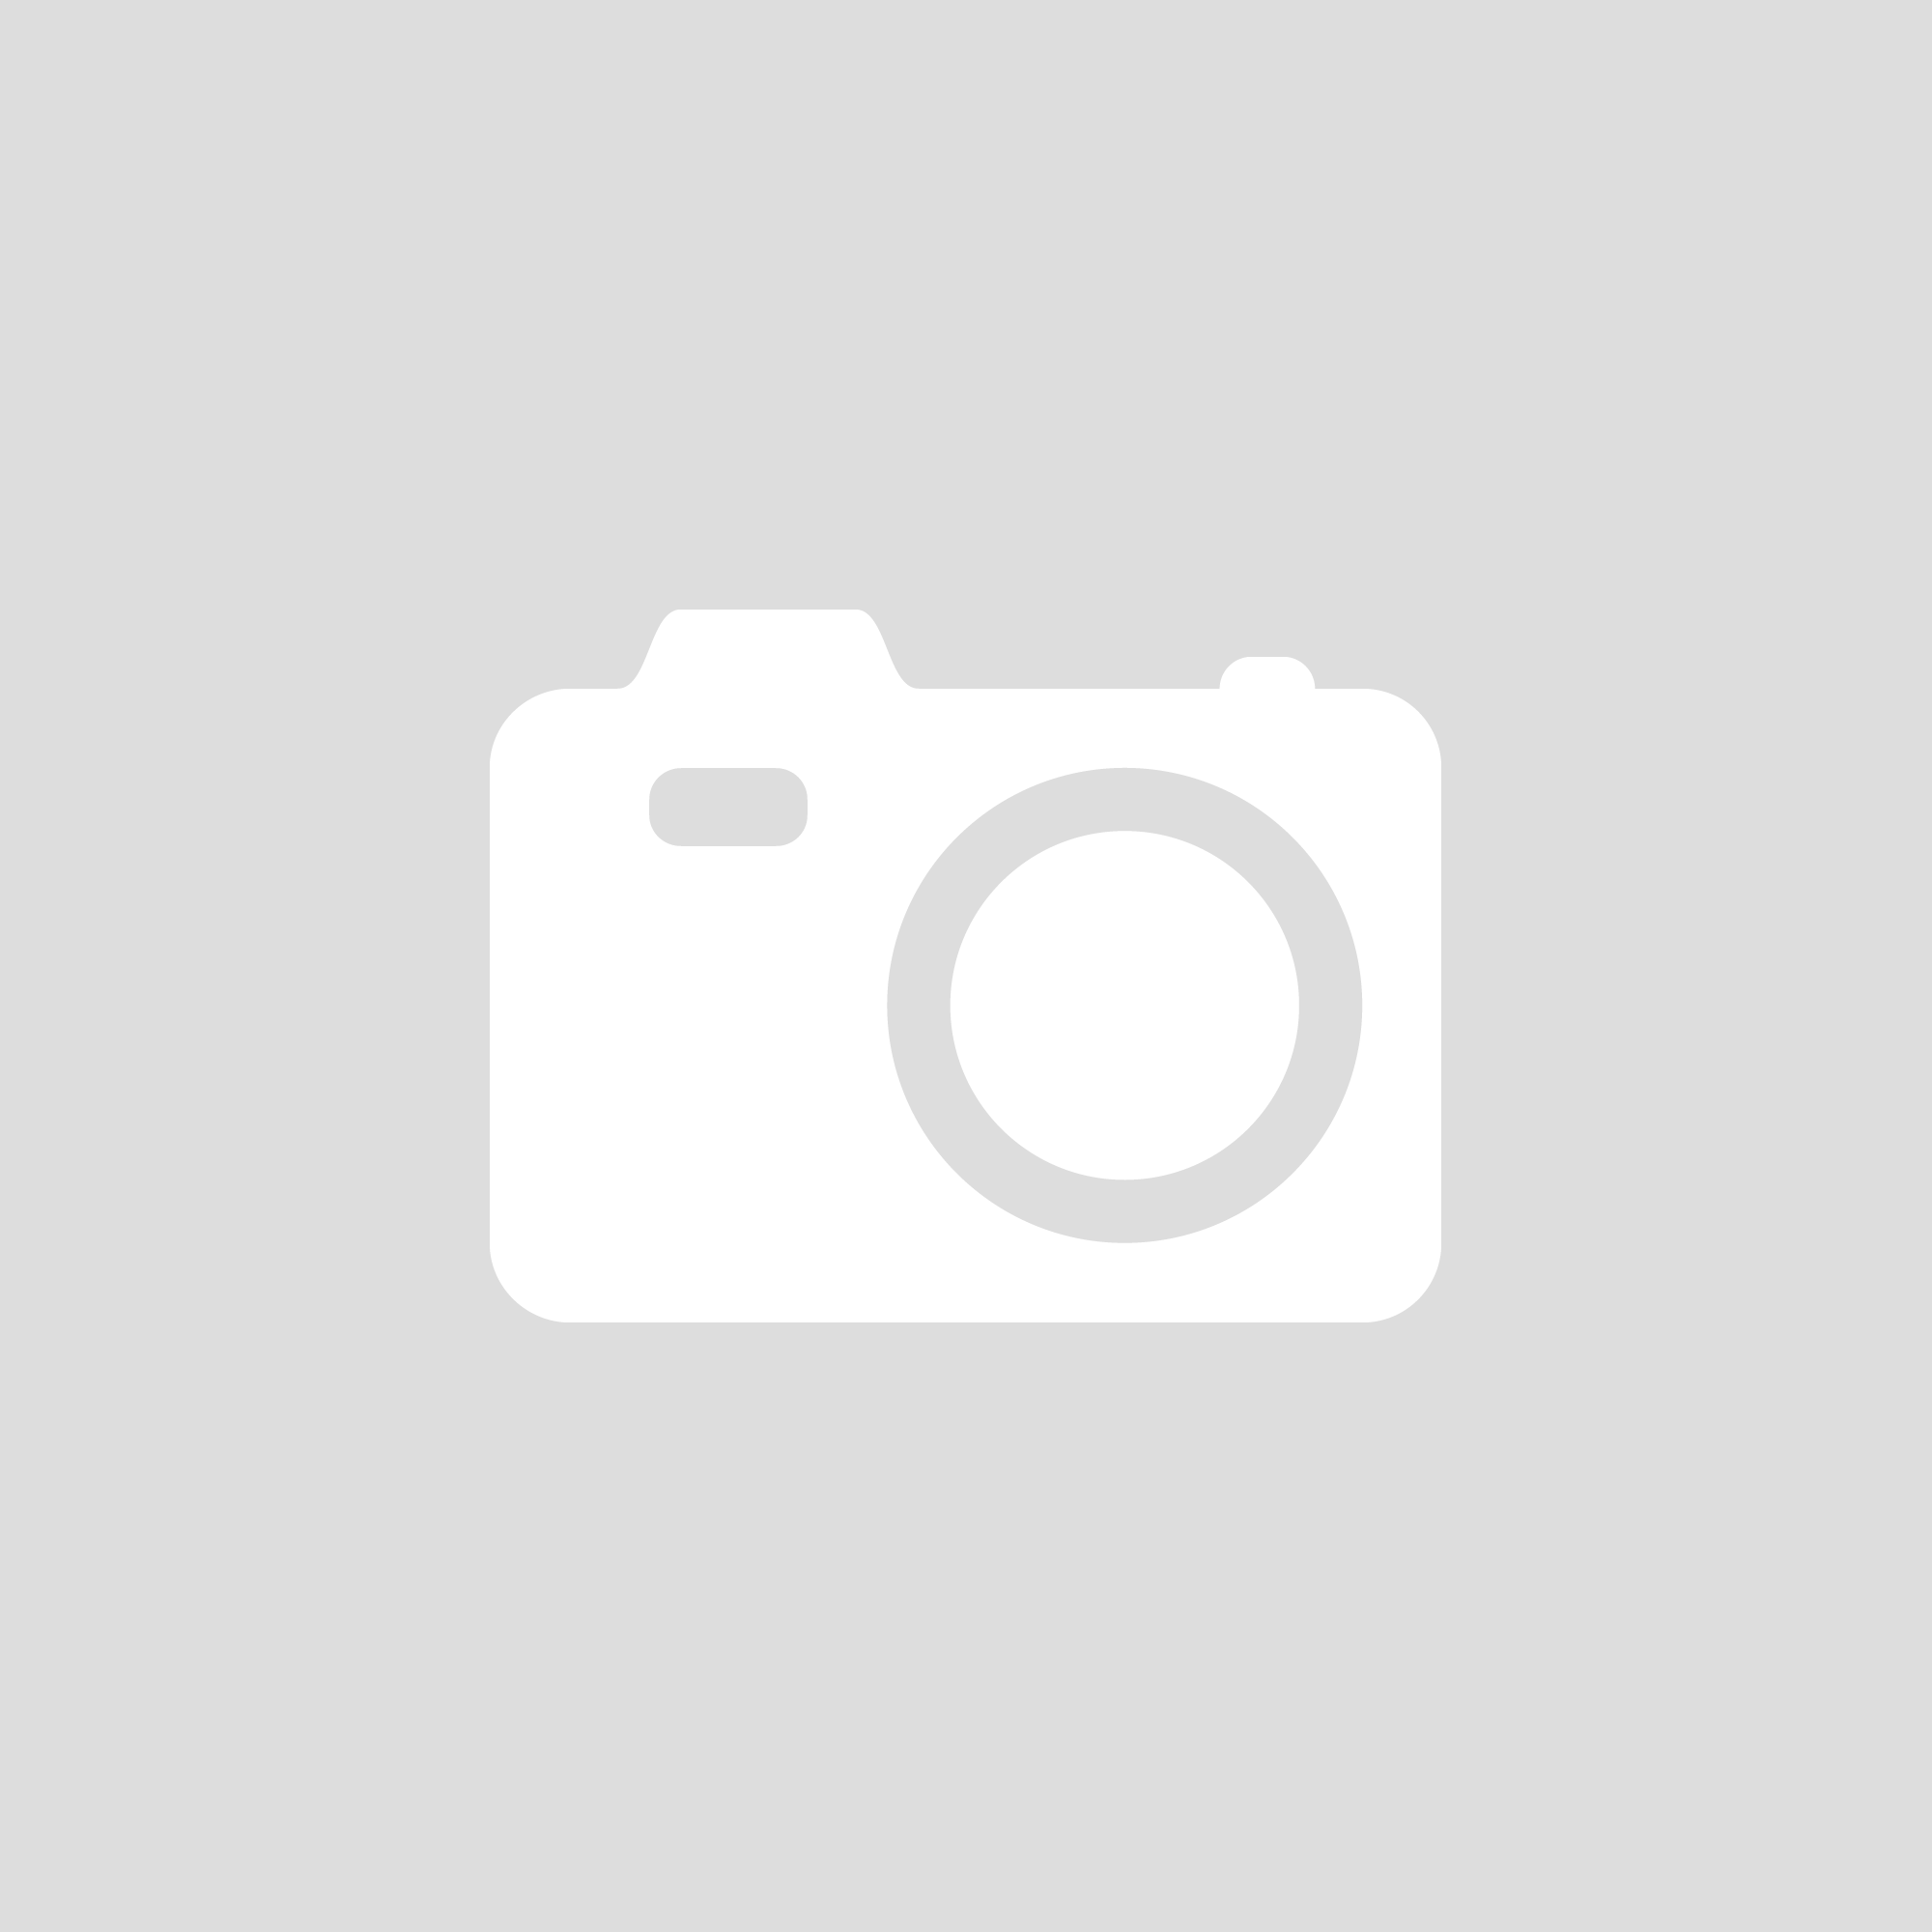 Luxe Matchstick Taupe Textured Wallpaper by Rasch 317534